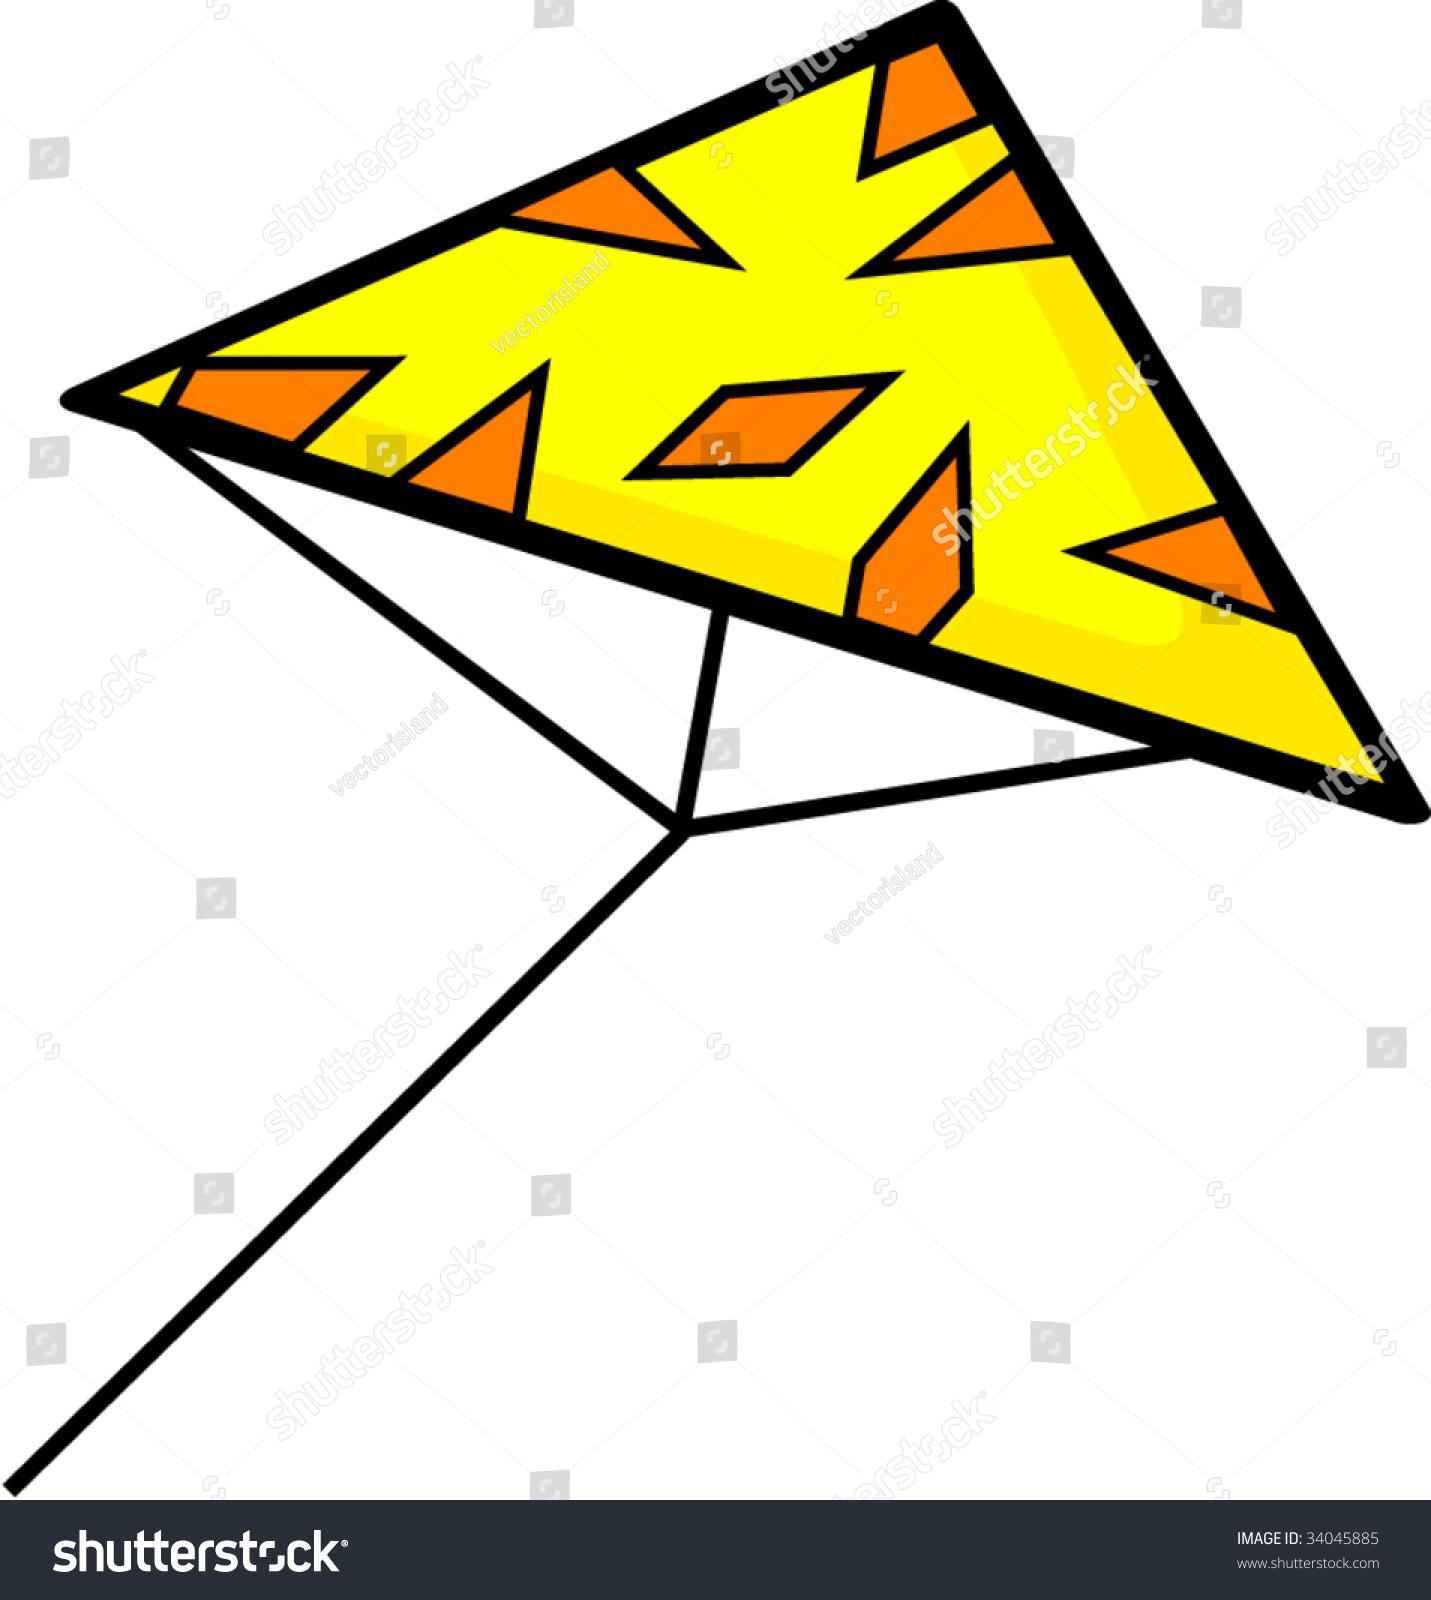 1431x1600 Kite Clipart Triangle